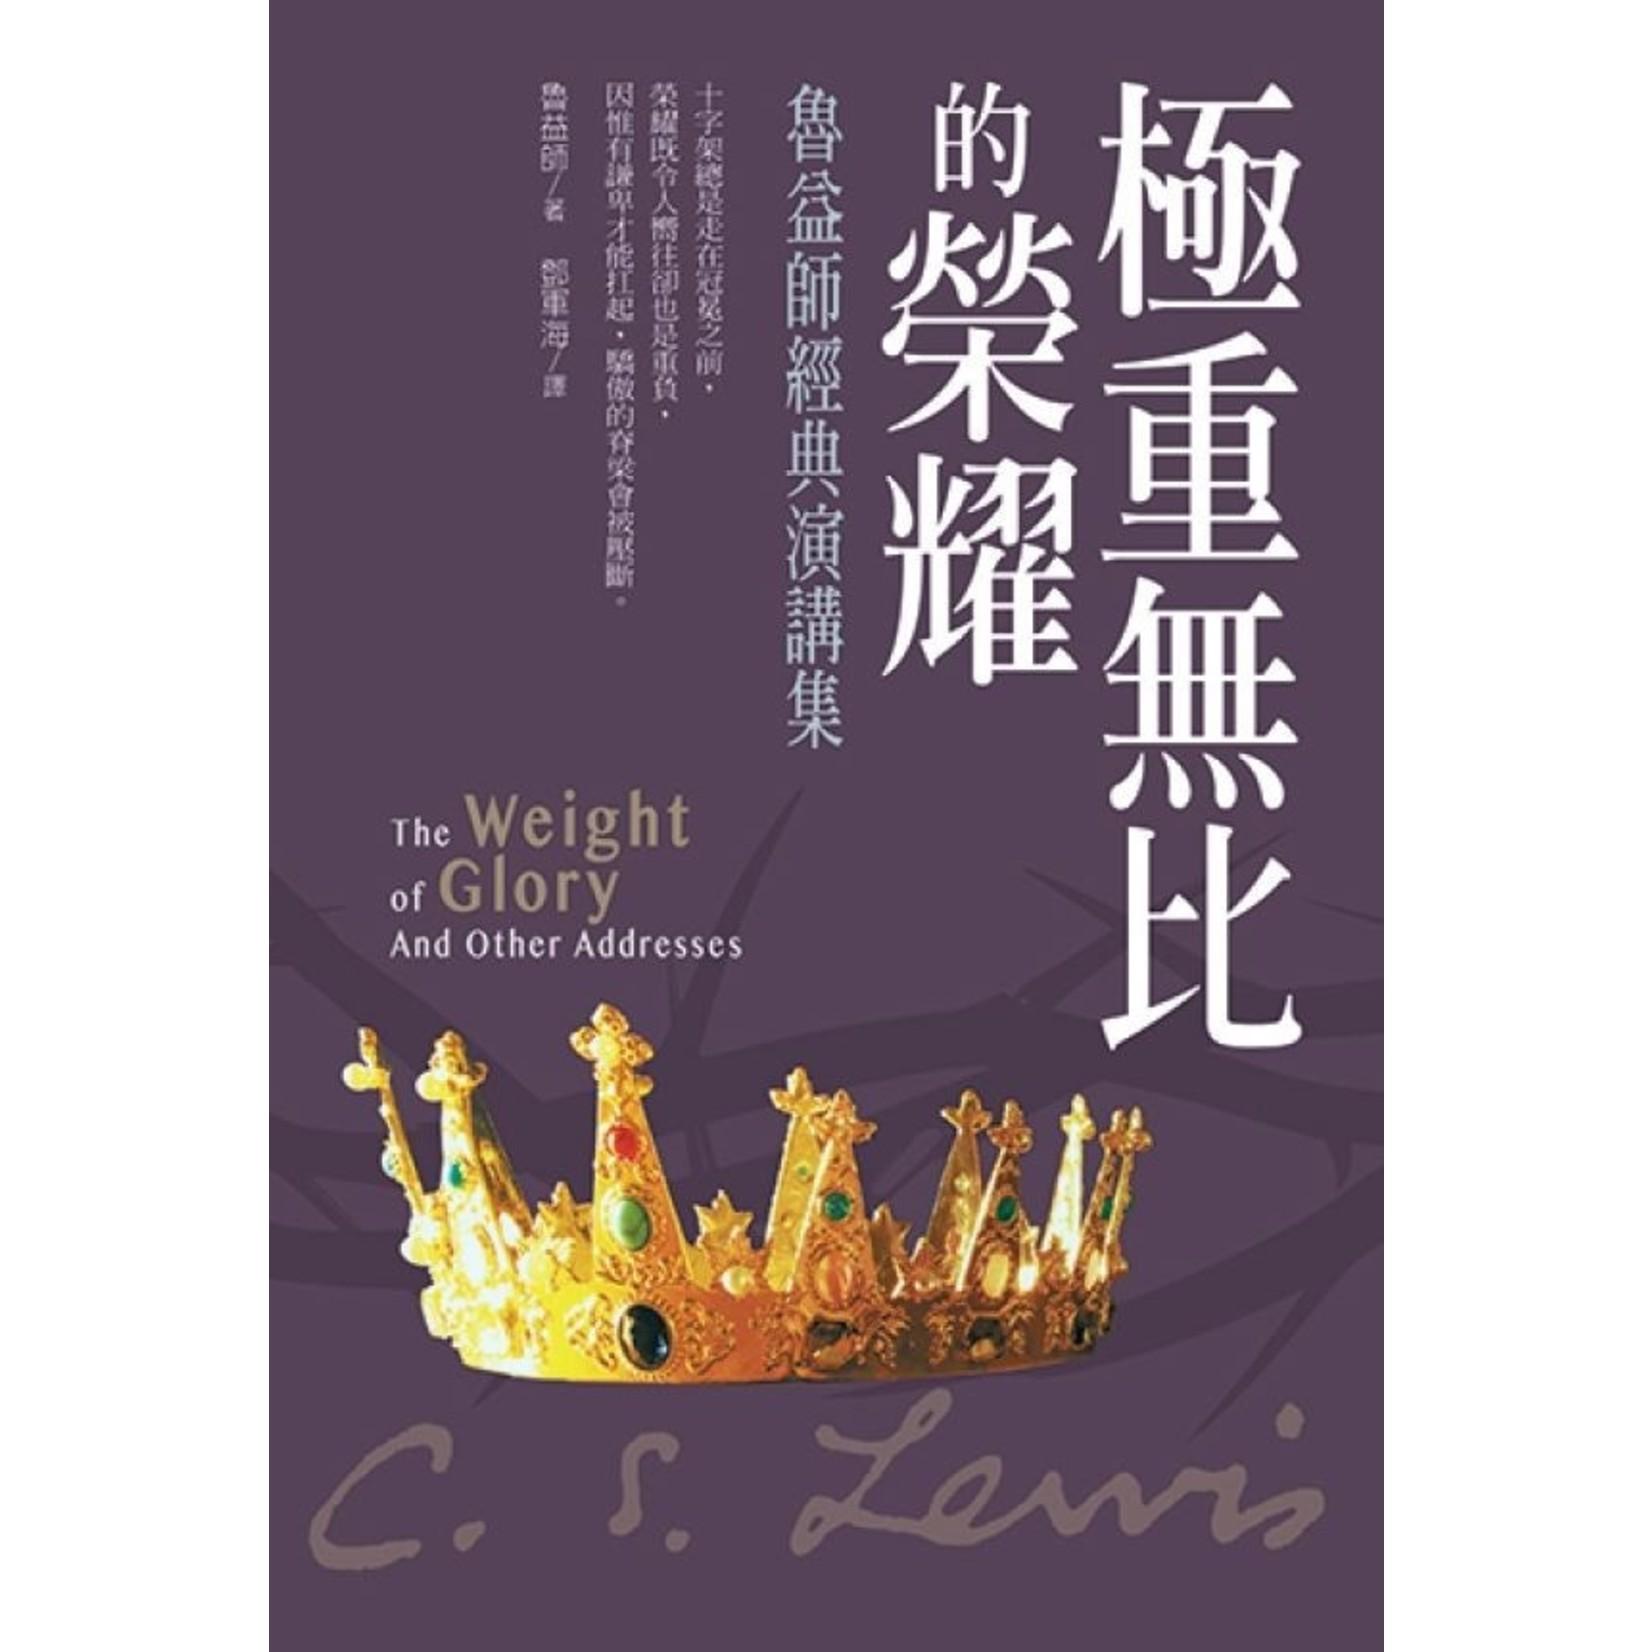 校園書房 Campus Books 極重無比的榮耀:魯益師經典演講集 The Weight of Glory And Other Addresses